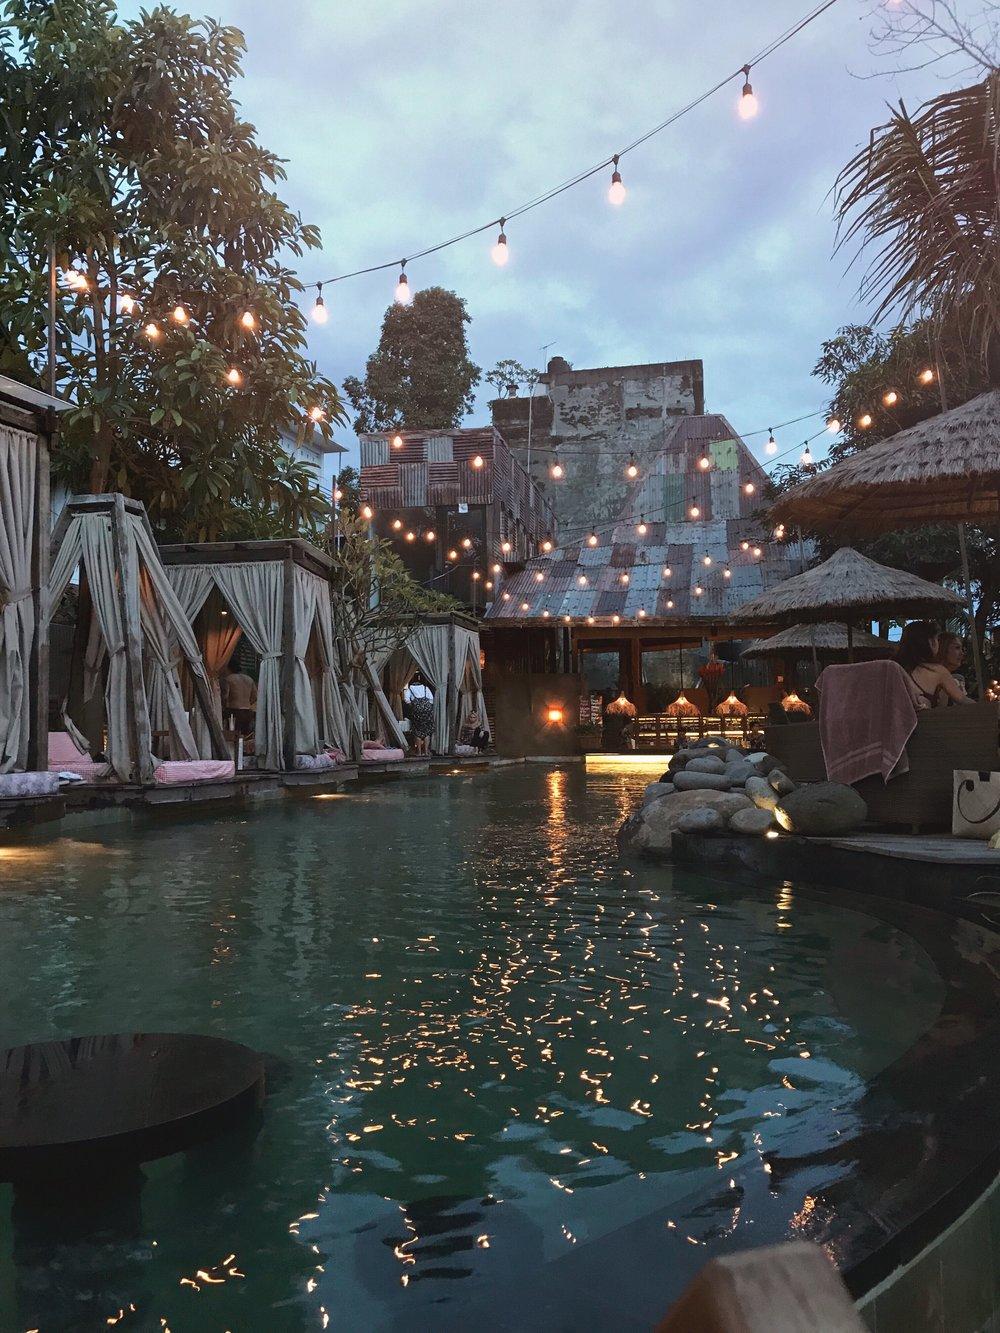 Folk Pool & Gardens Bali.jpeg